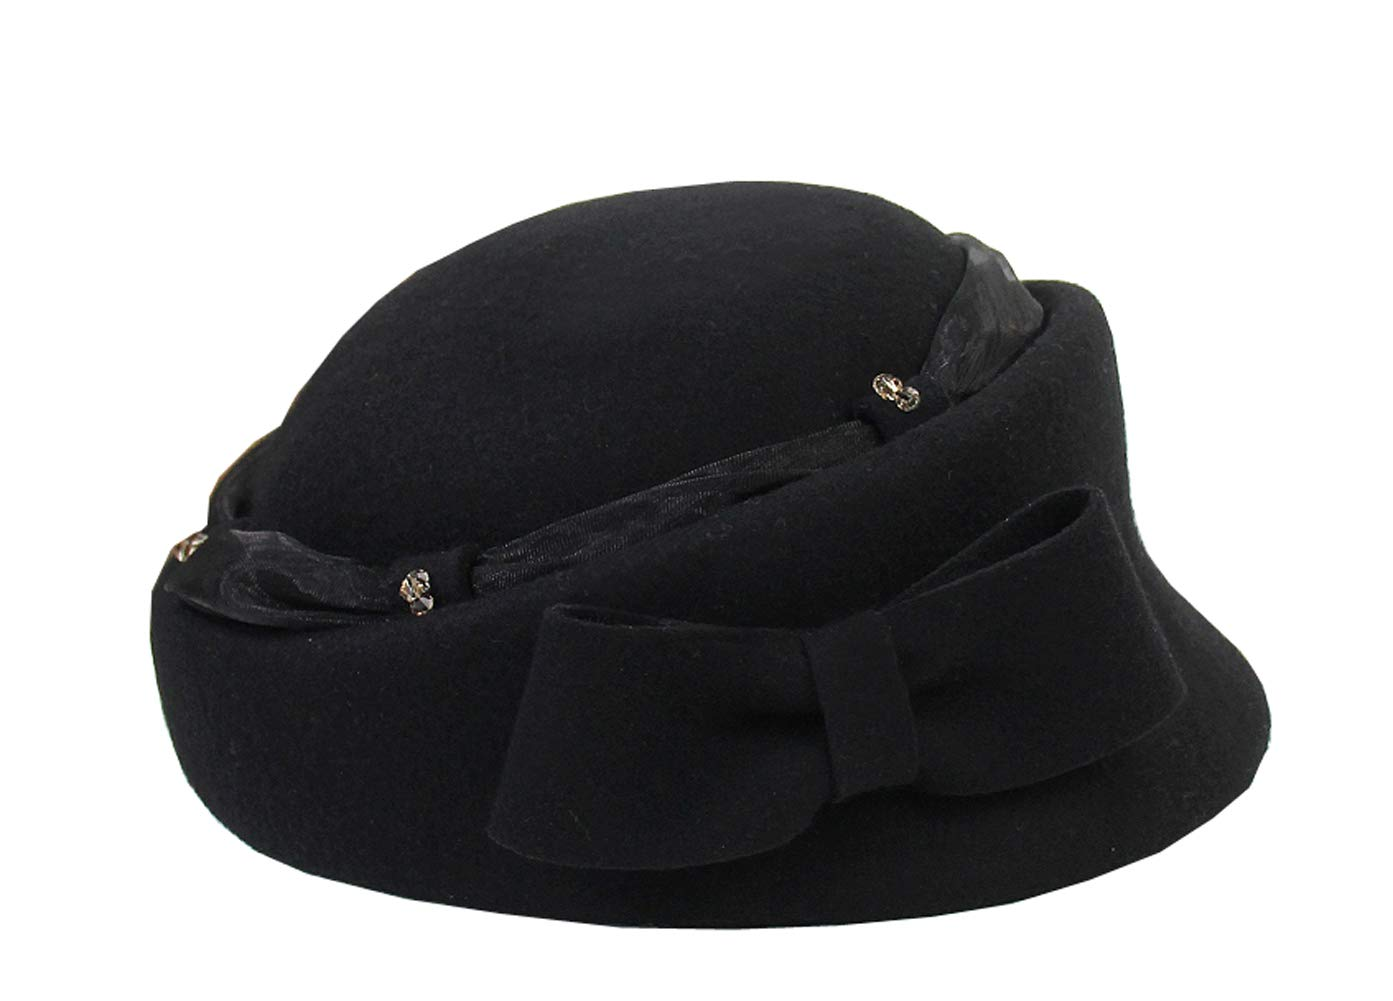 KM Women Elegant British Beret Hat Fashion Woolen Warm Round Top Cap for Outgoing Travel Holiday (Black) by KM hat